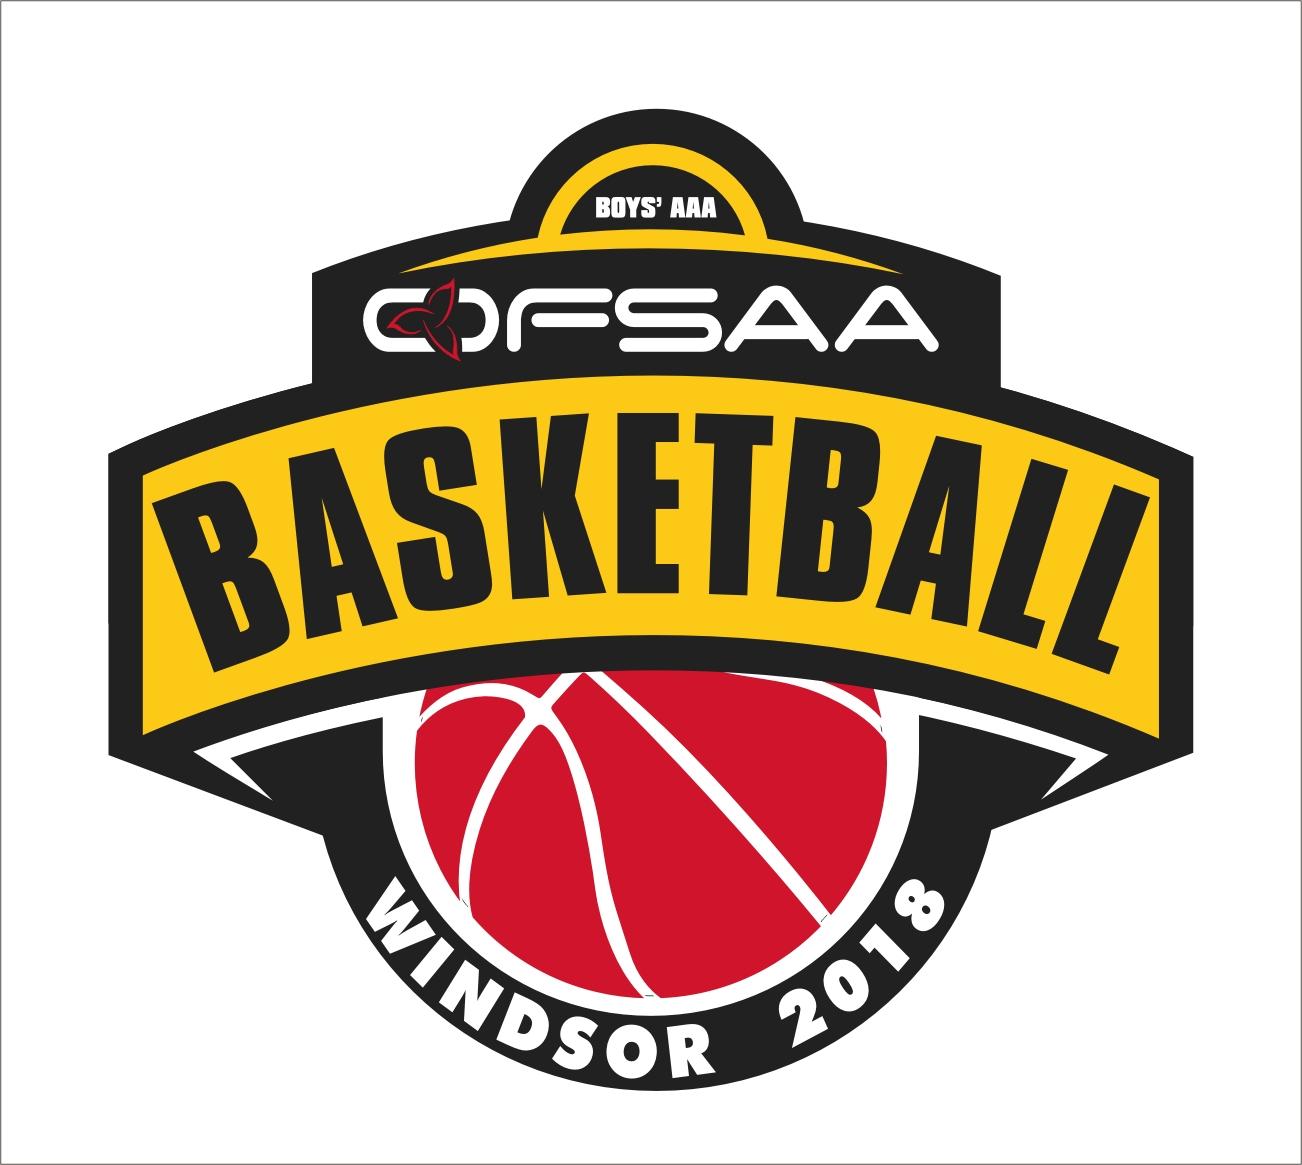 2018 Boys AAA Basketball logo white.jpg